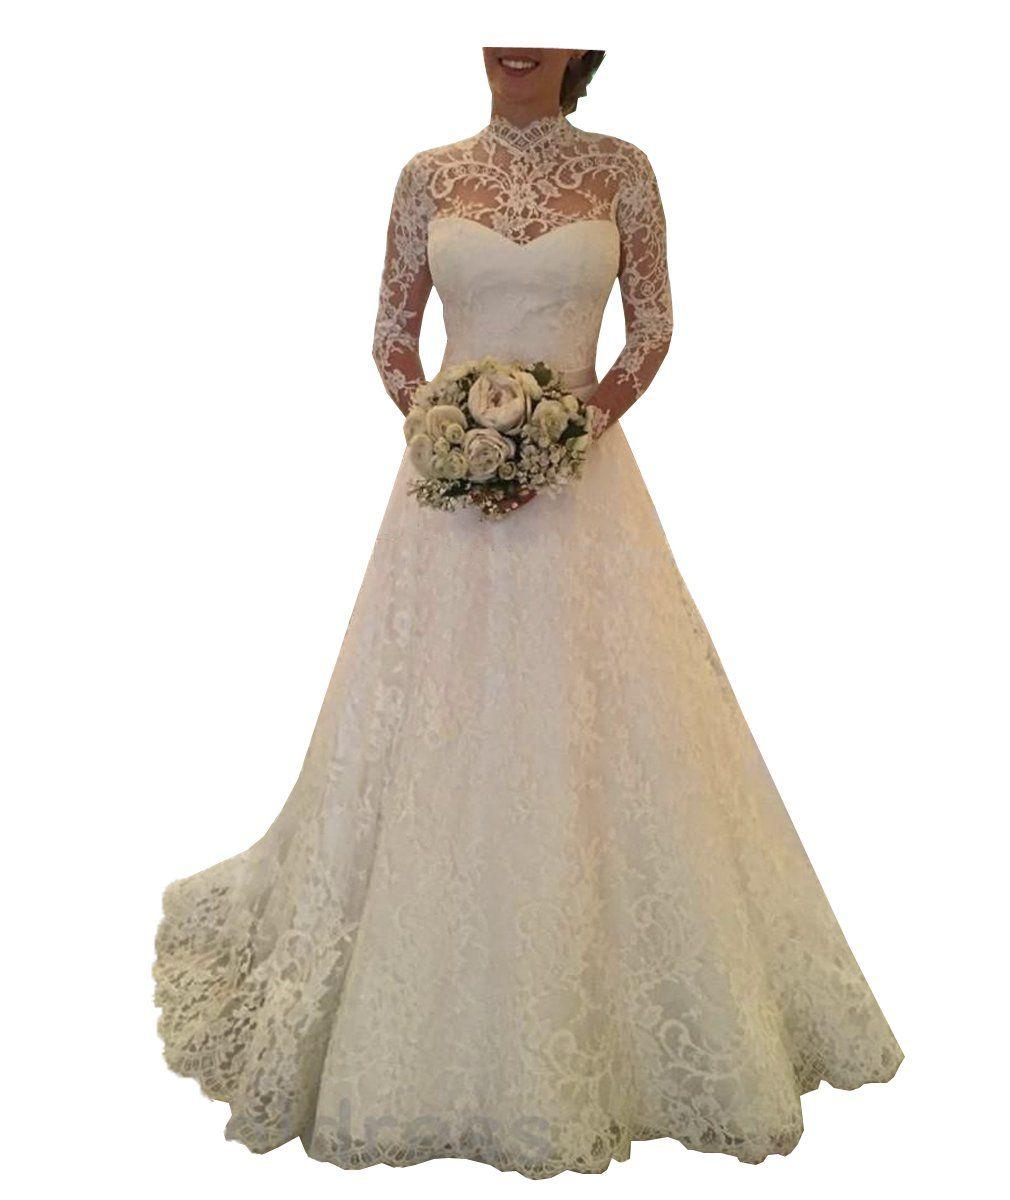 Dbbeautyshop womens lace long sleeve wedding dress backless beach